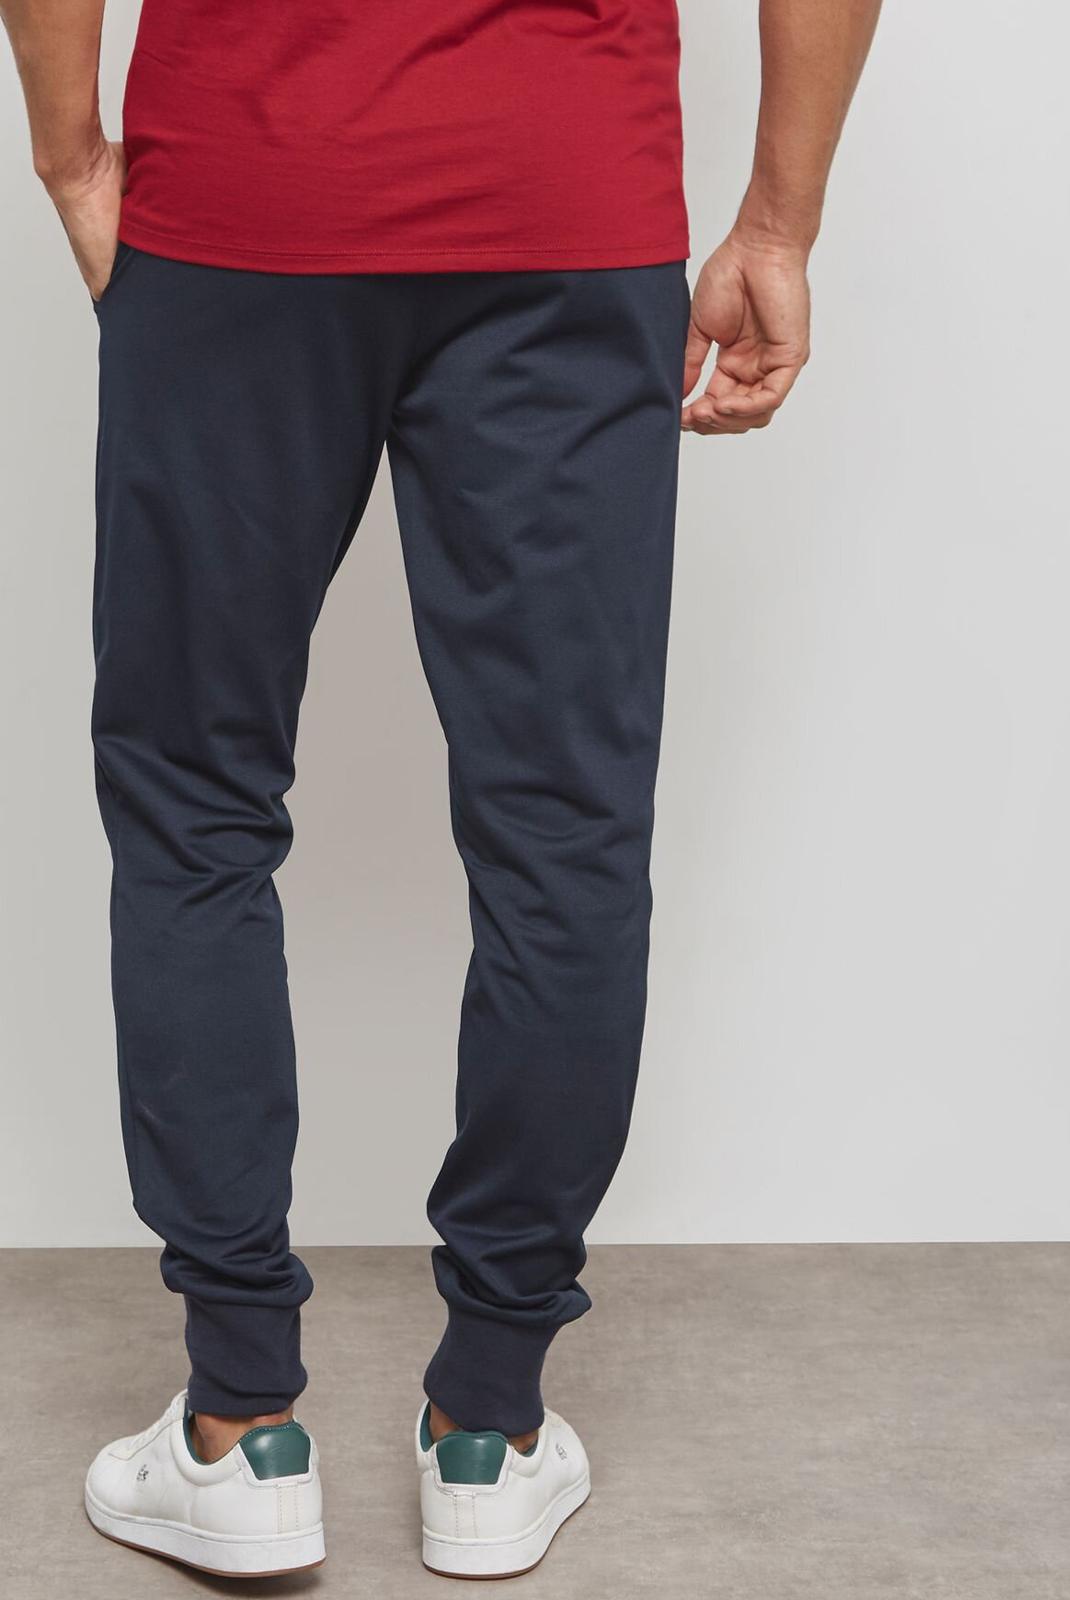 Pantalons sport/streetwear  Lacoste XH0452 00166 marine - blanc